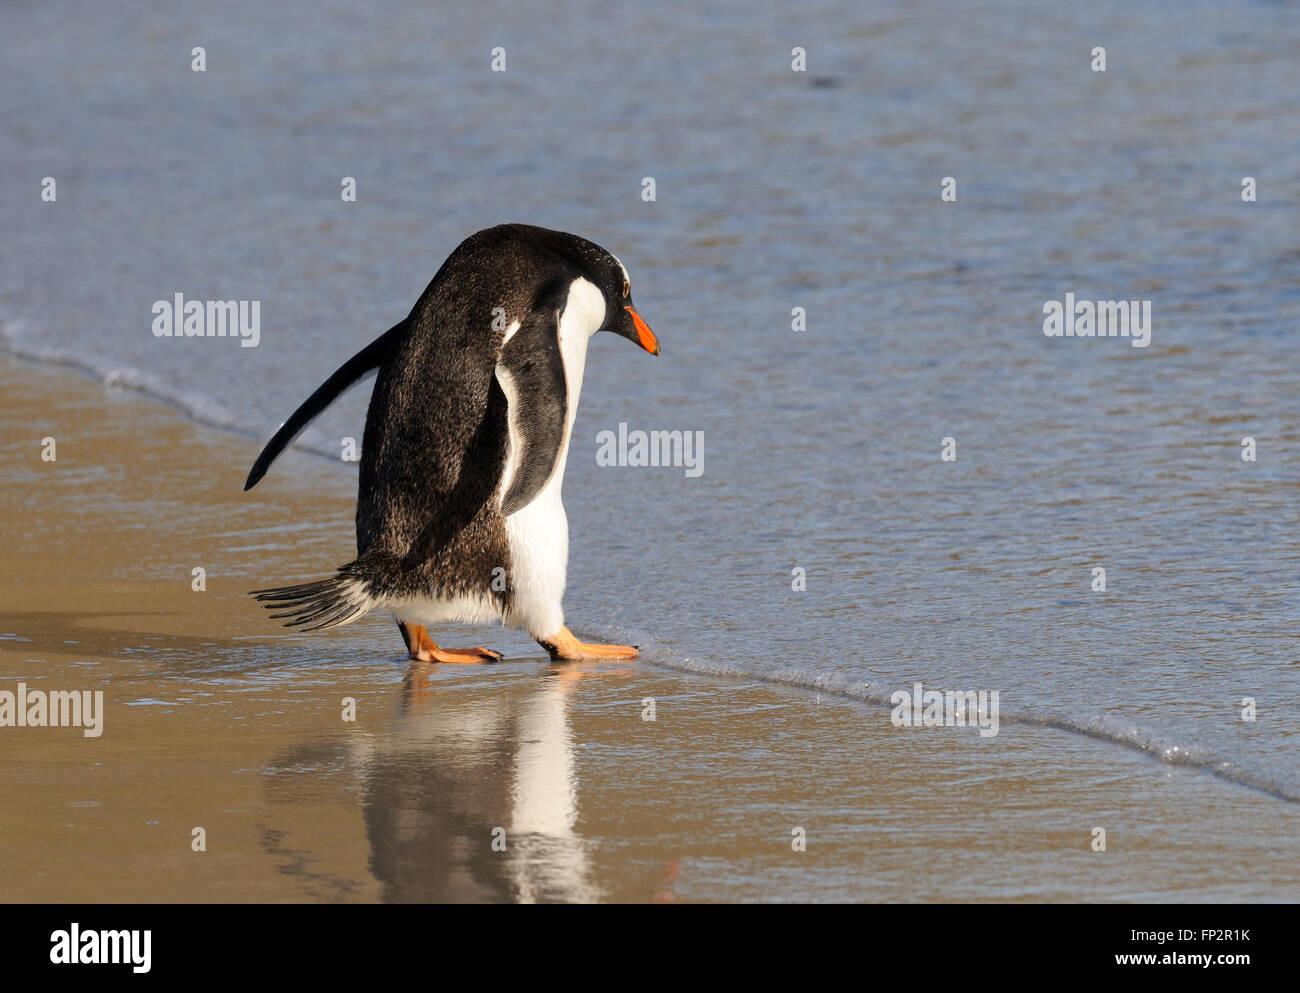 A gentoo penguin  (Pygoscelis papua) enter the sea near its nesting colony on Saunders Island. Saunders Island, - Stock Image